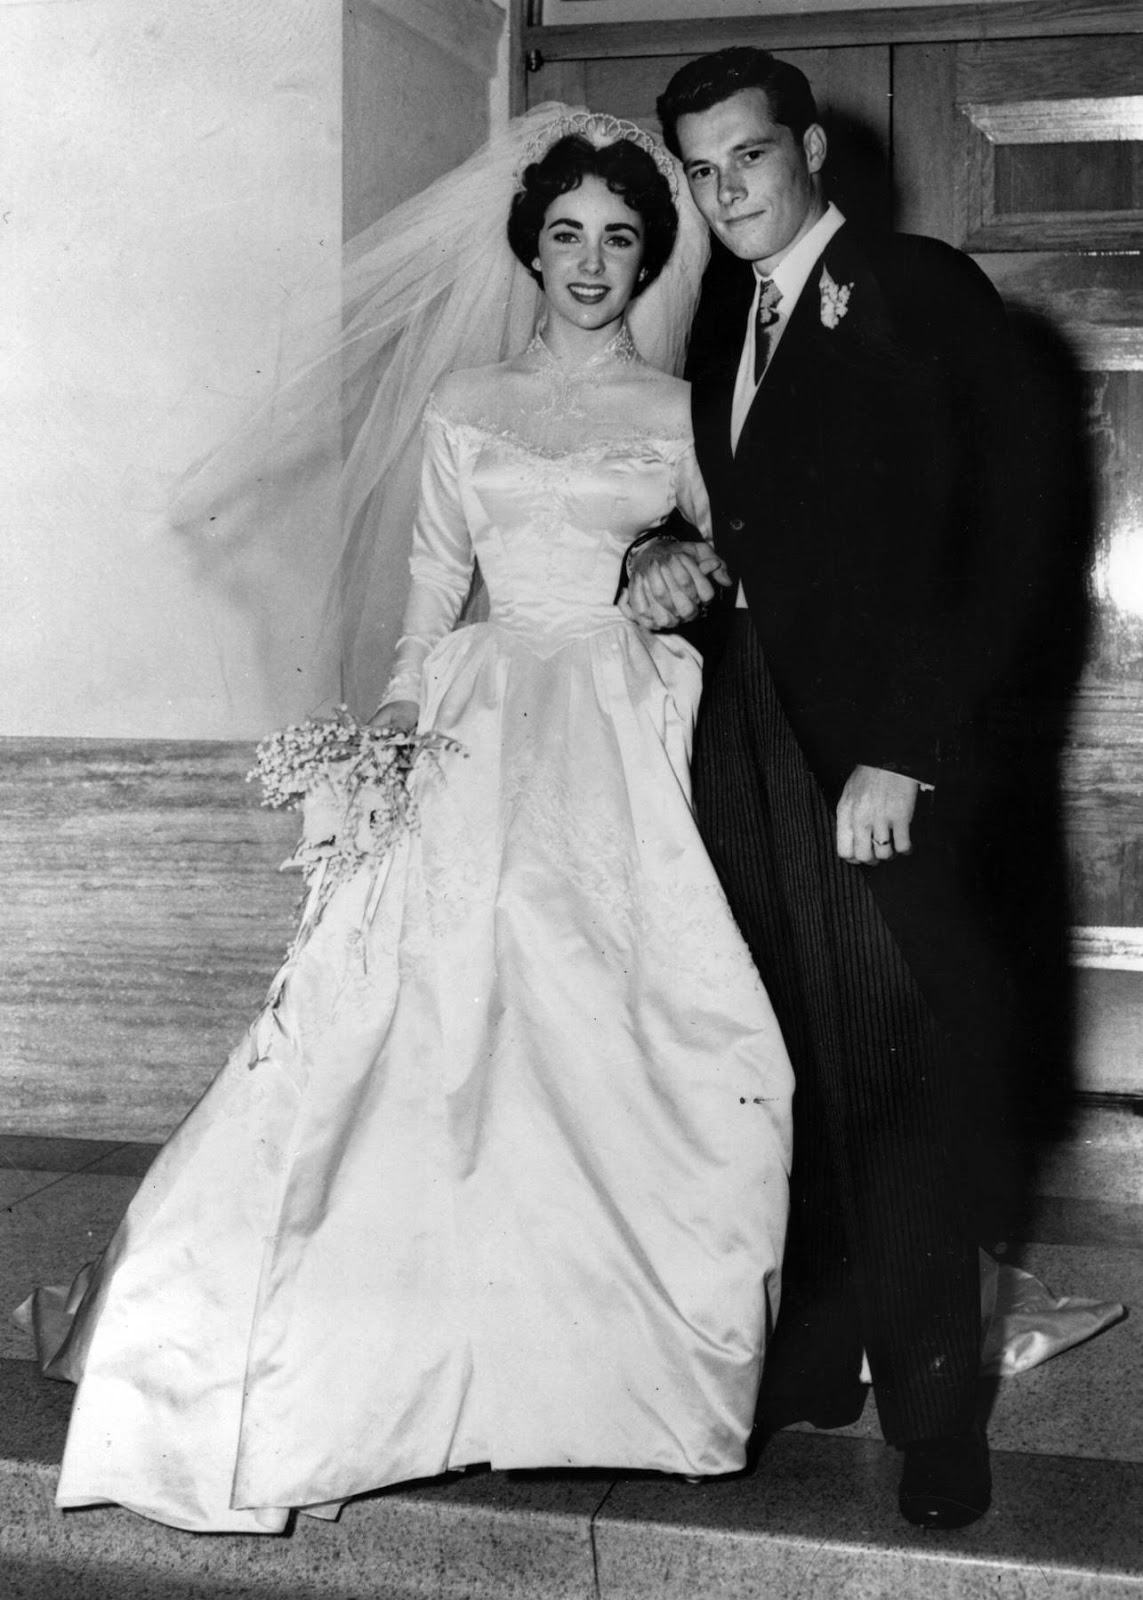 bridal workbook vintage 1950s style wedding inspiration With elizabeth taylor wedding dresses